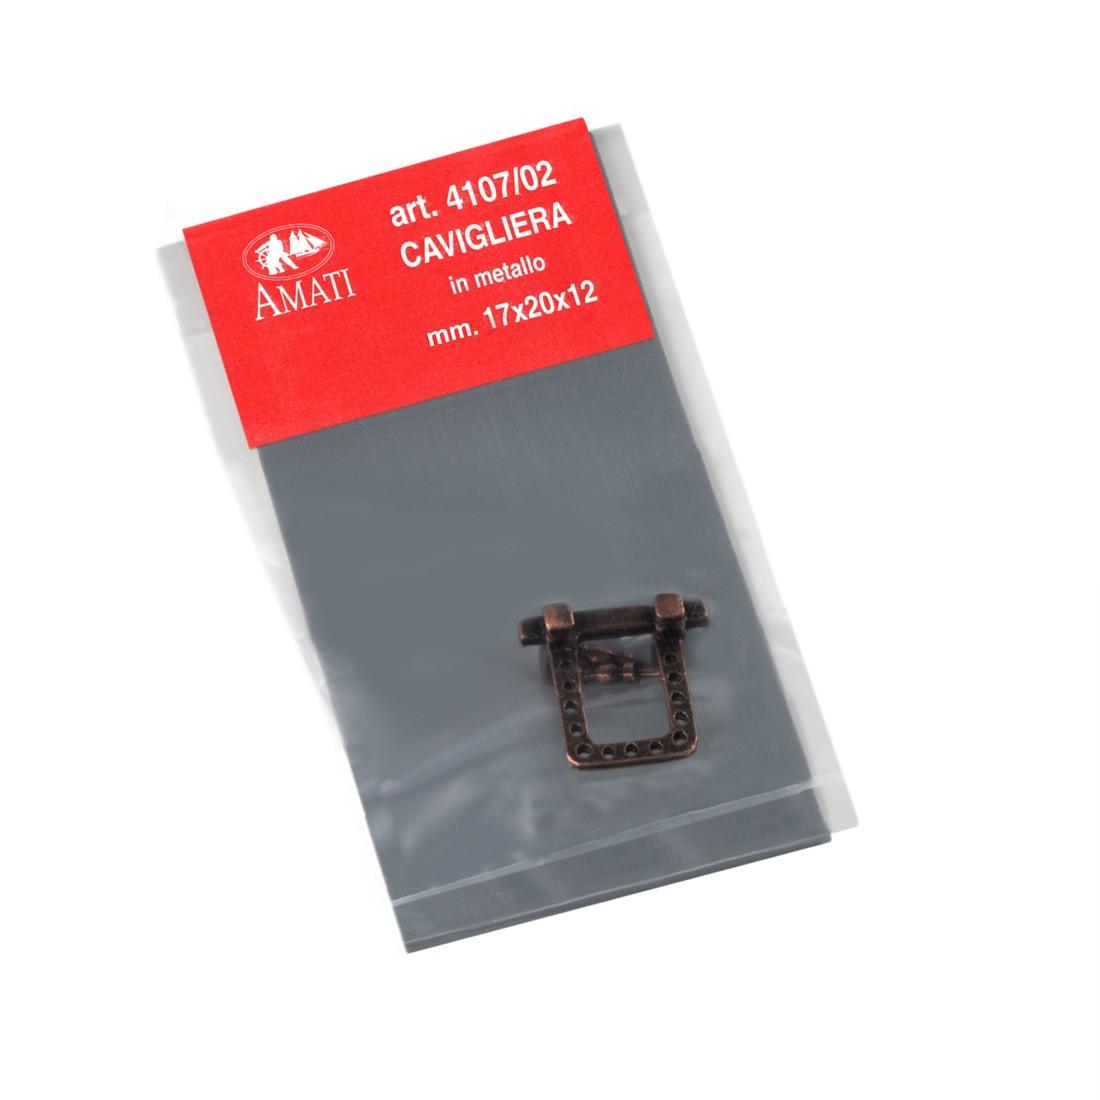 Metal pin rails for masts mm.17x20x12